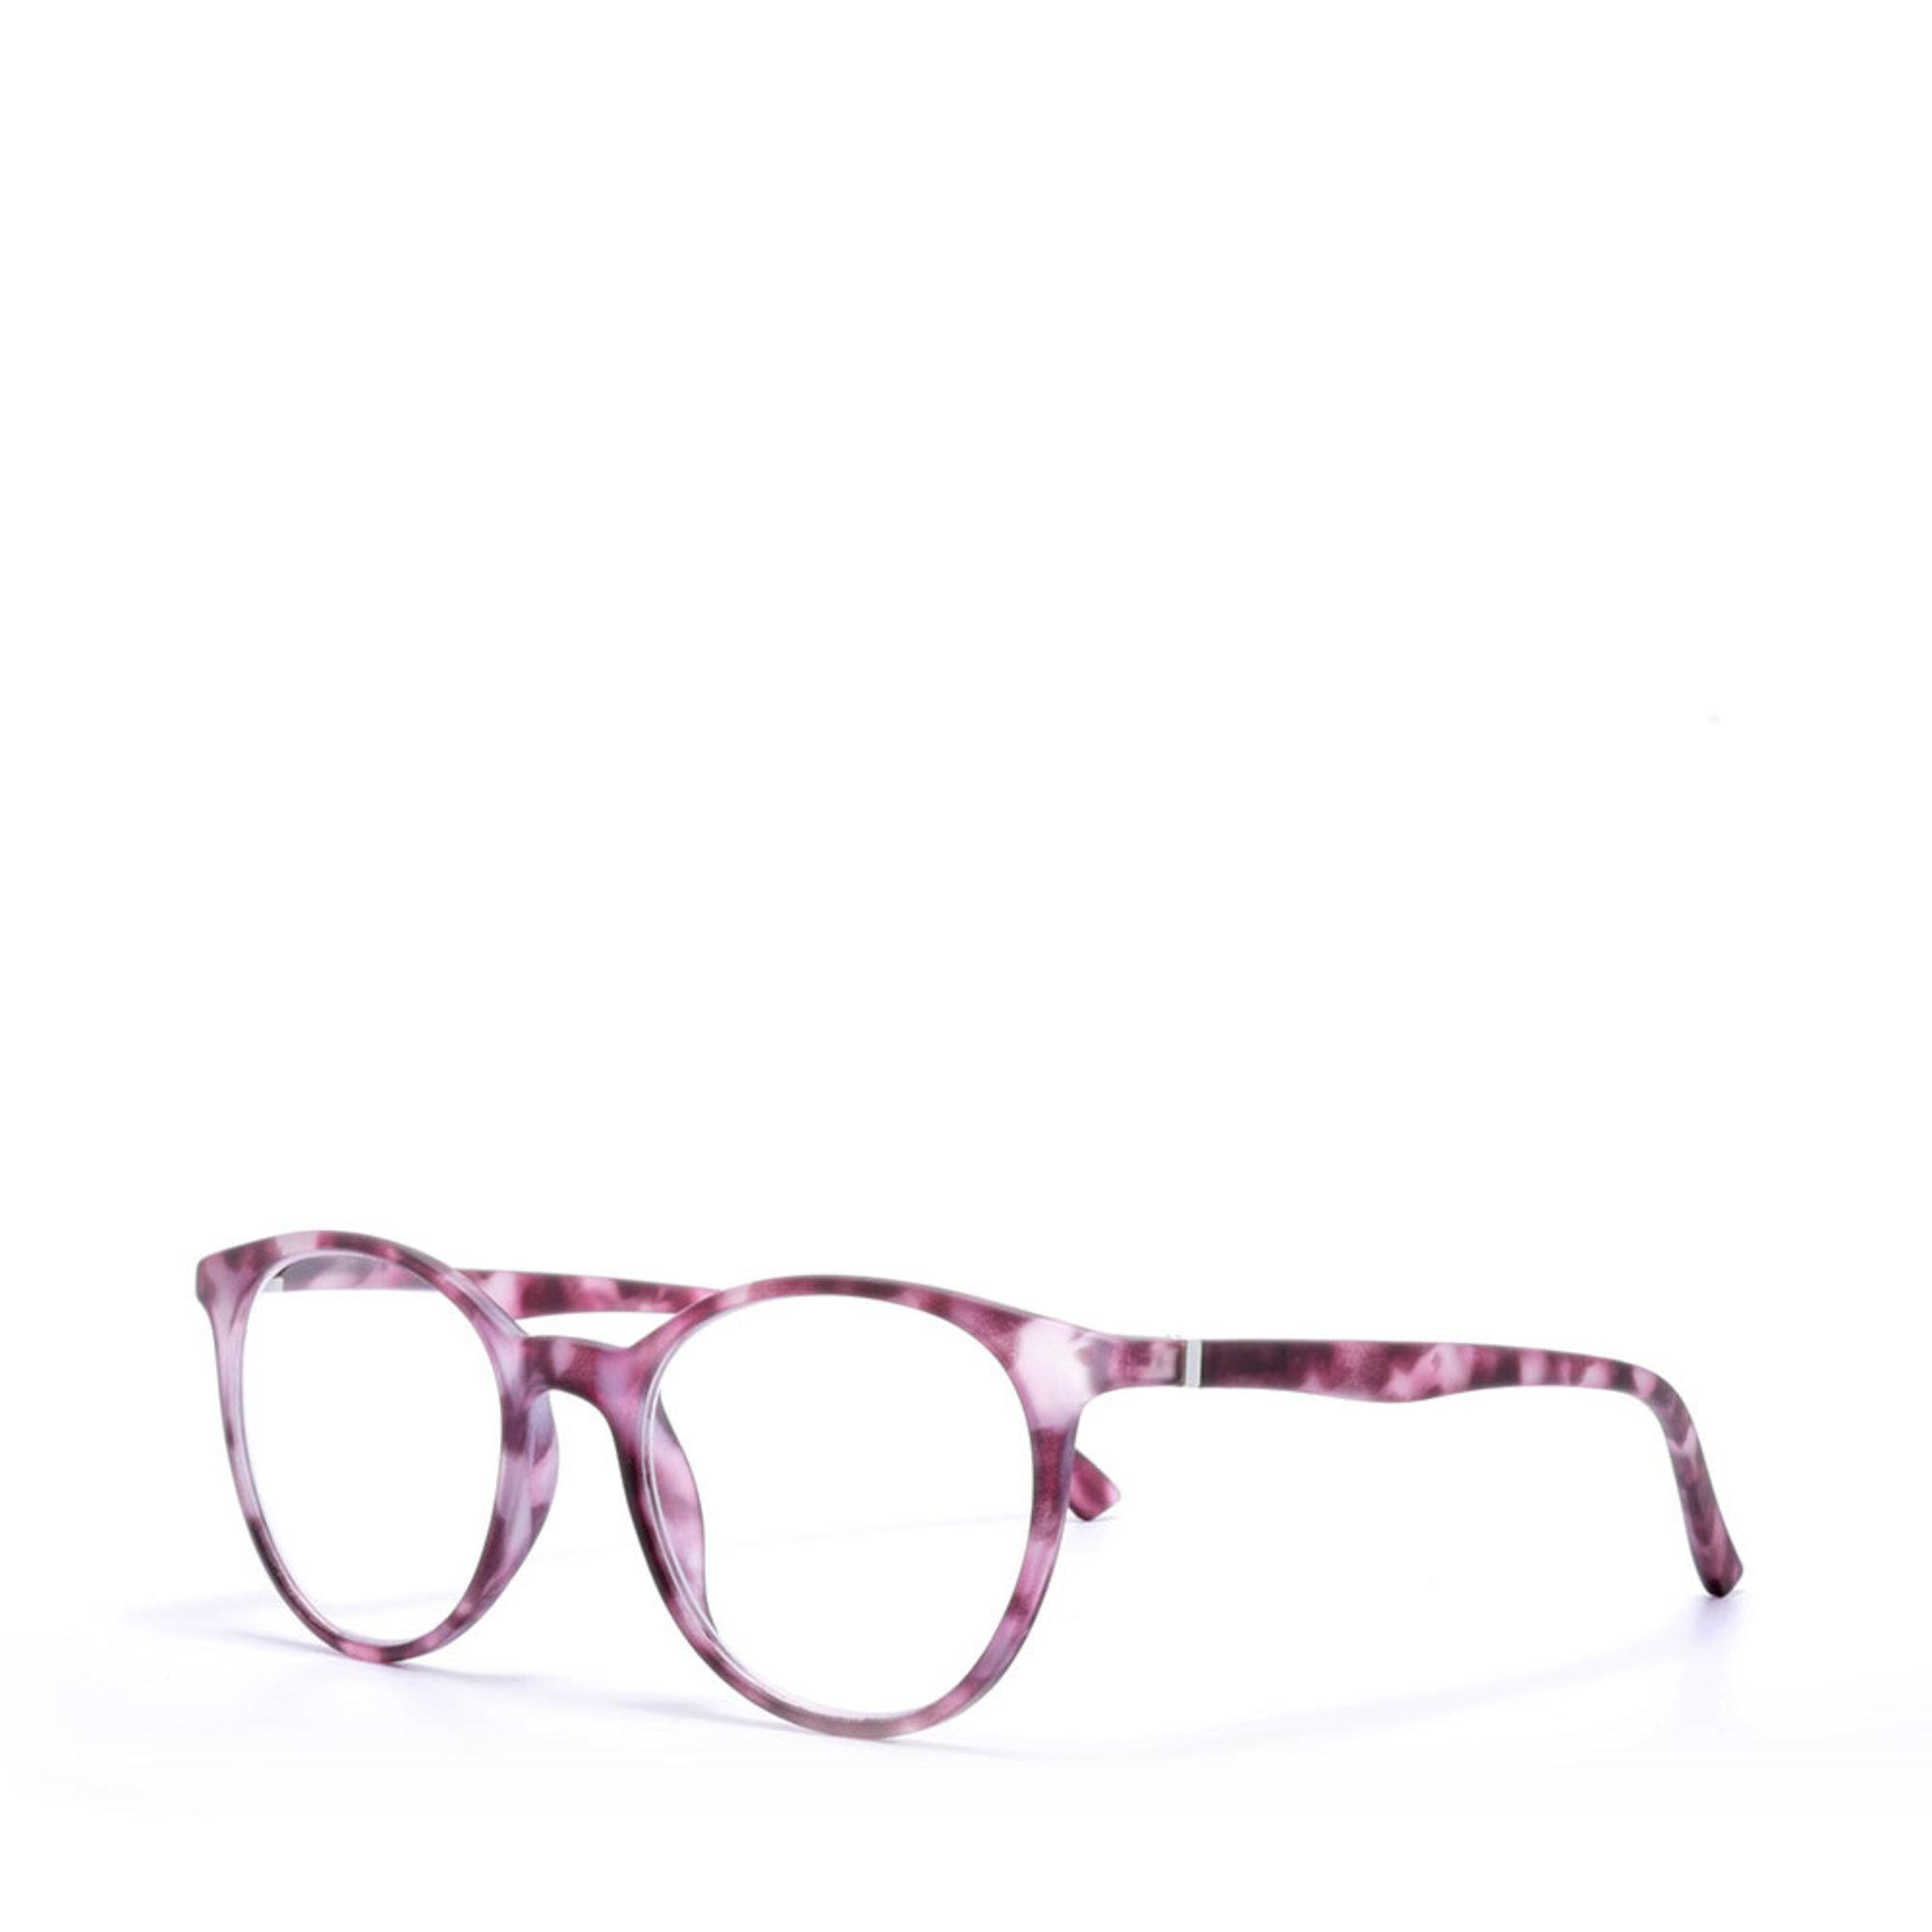 Demi Pink Reading Glasses, +2